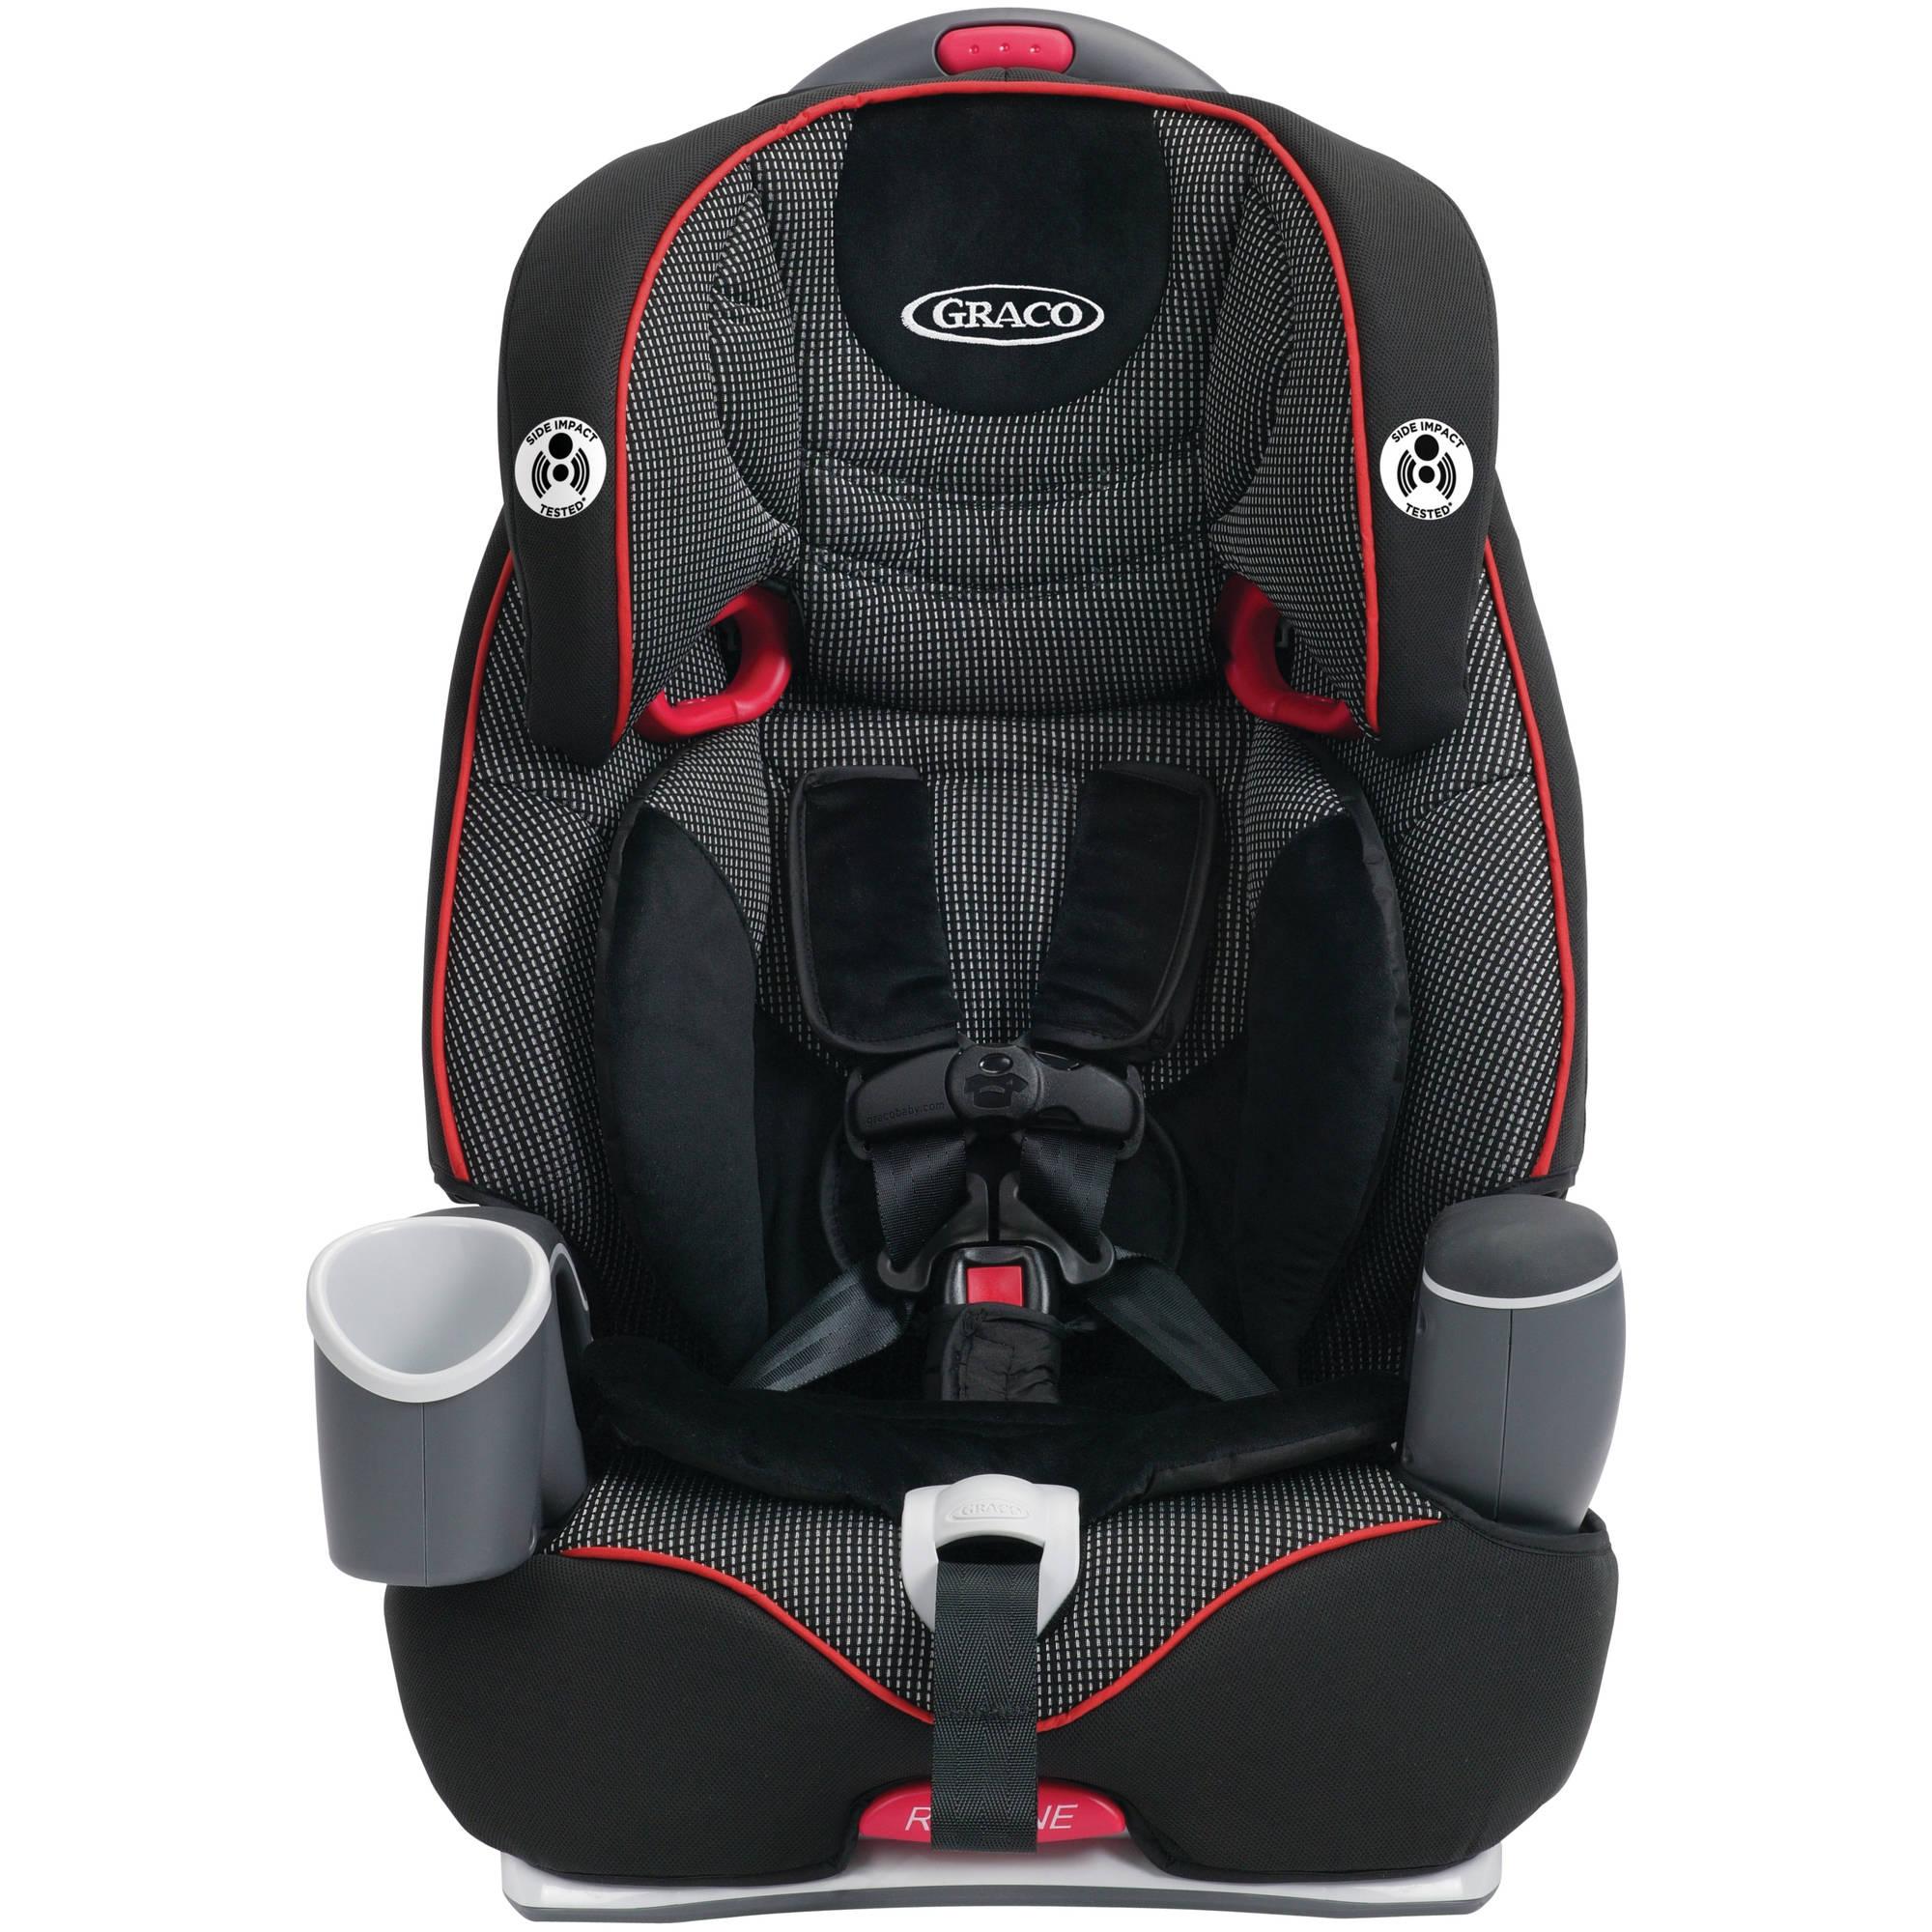 Graco nautilus 3 in 1 multi use car seat - Graco Nautilus 3 In 1 Multi Use Car Seat 2